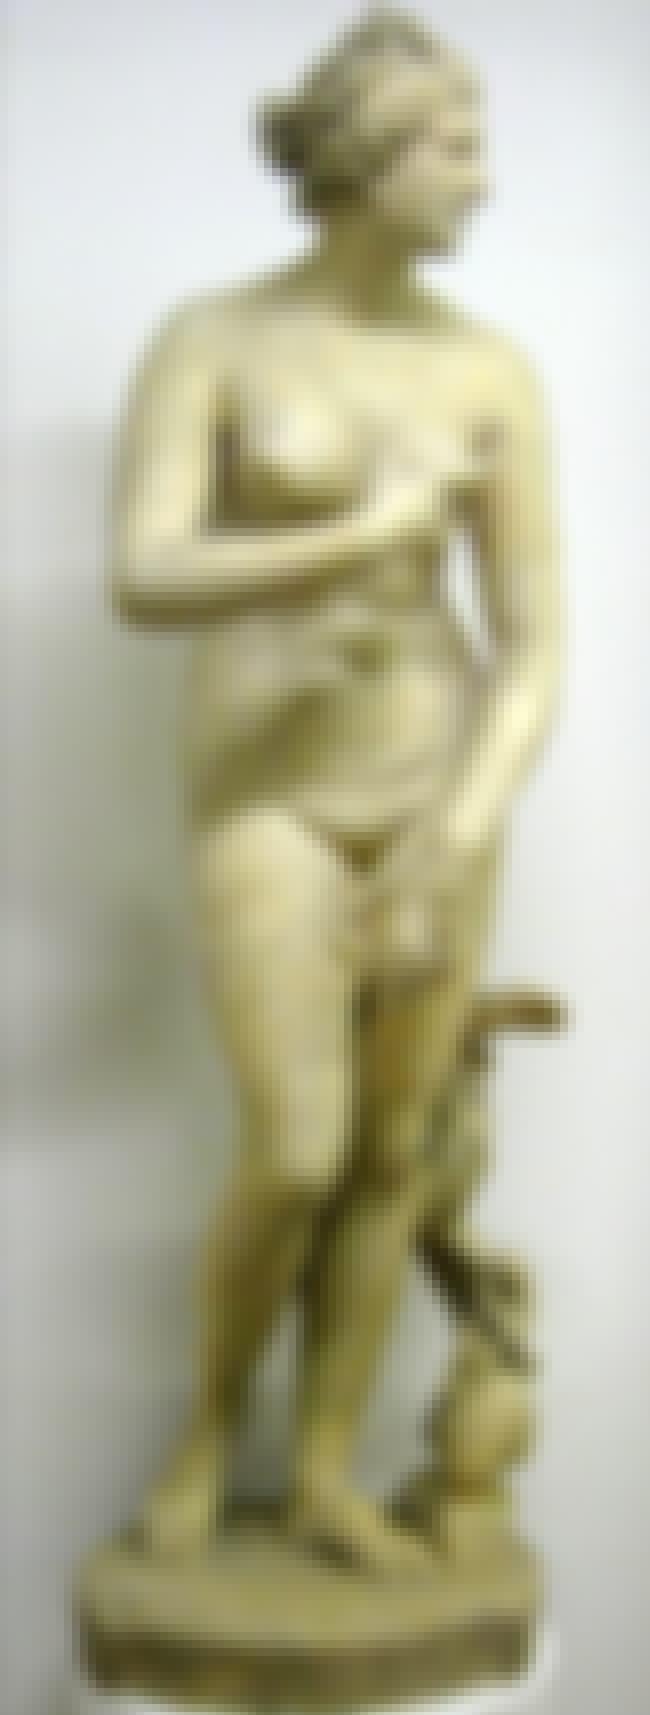 Venus de' Medici is listed (or ranked) 5 on the list Famous Hellenistic Art Sculptures